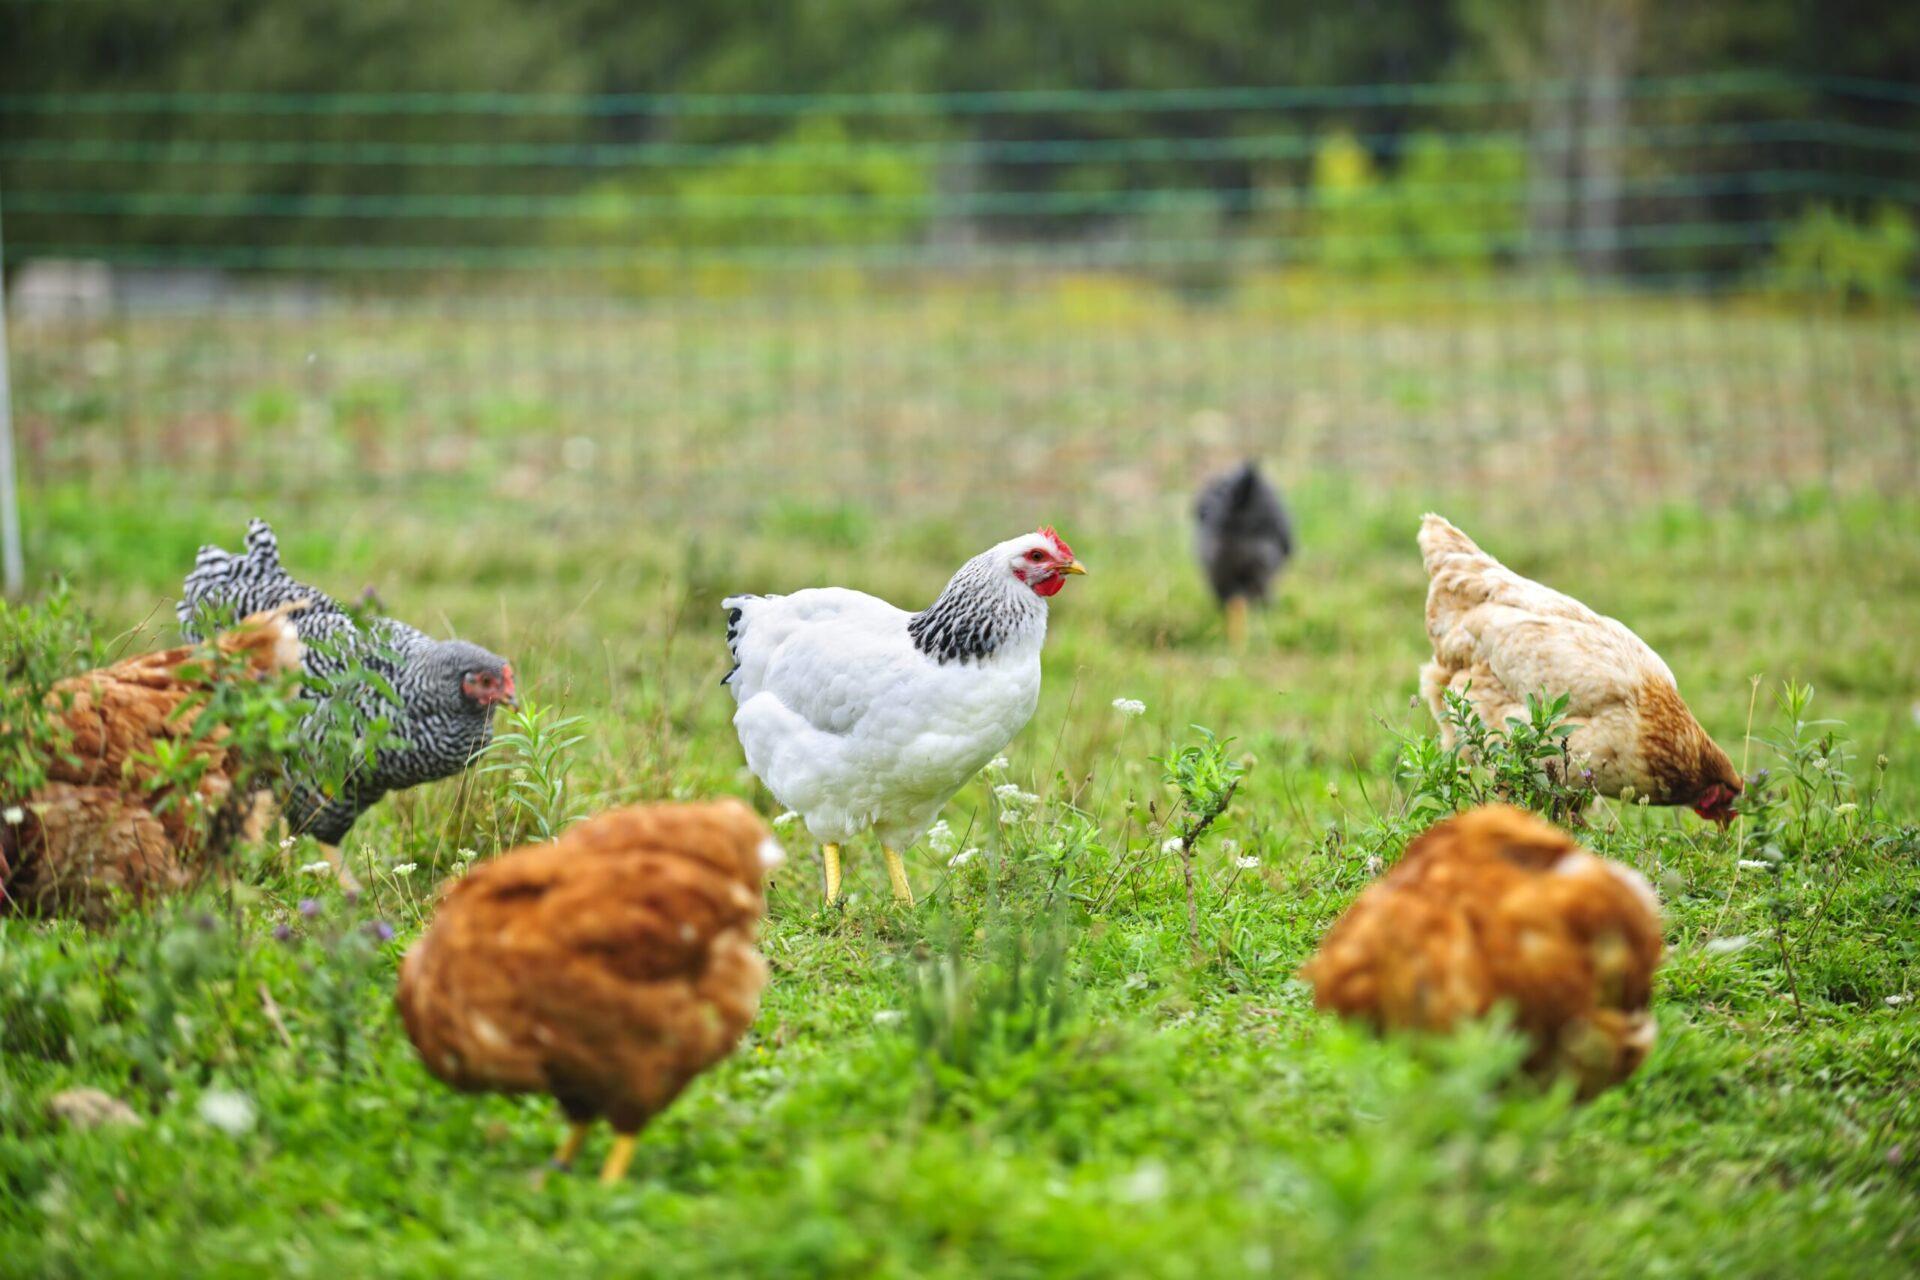 Various free range chickens feeding on grass at organic farm